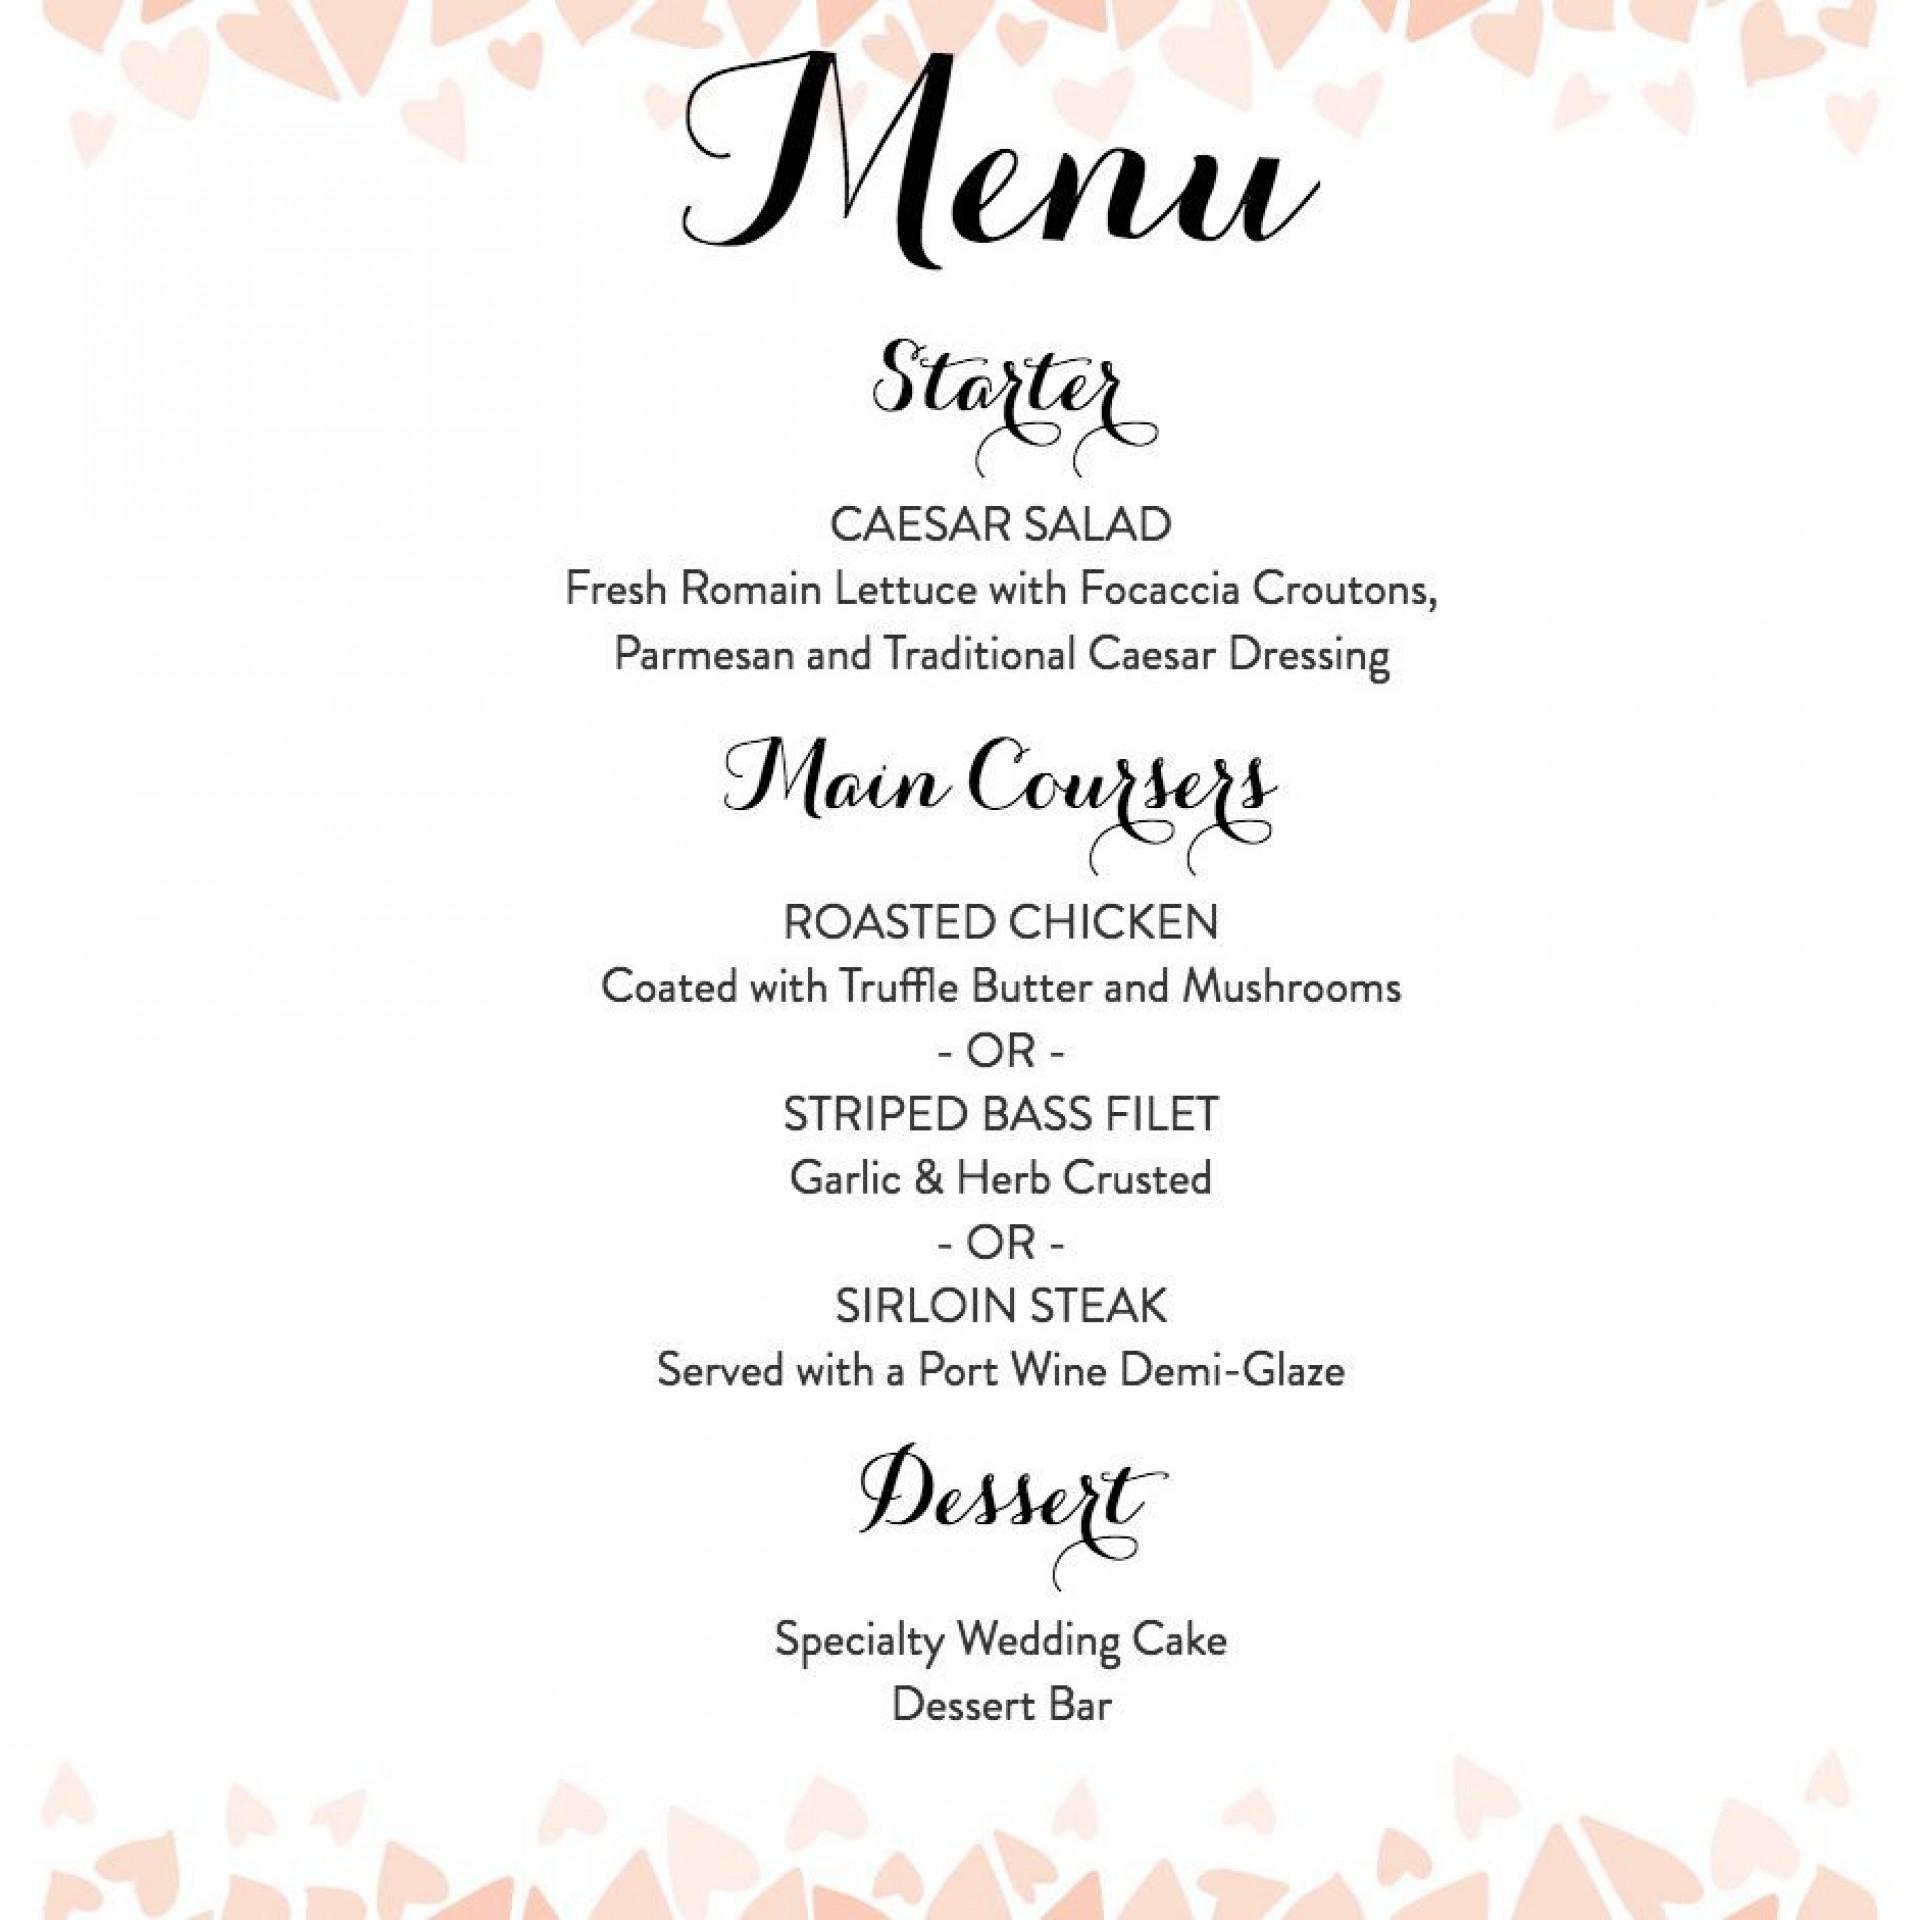 007 Unusual Free Online Wedding Menu Template Concept  Templates1920